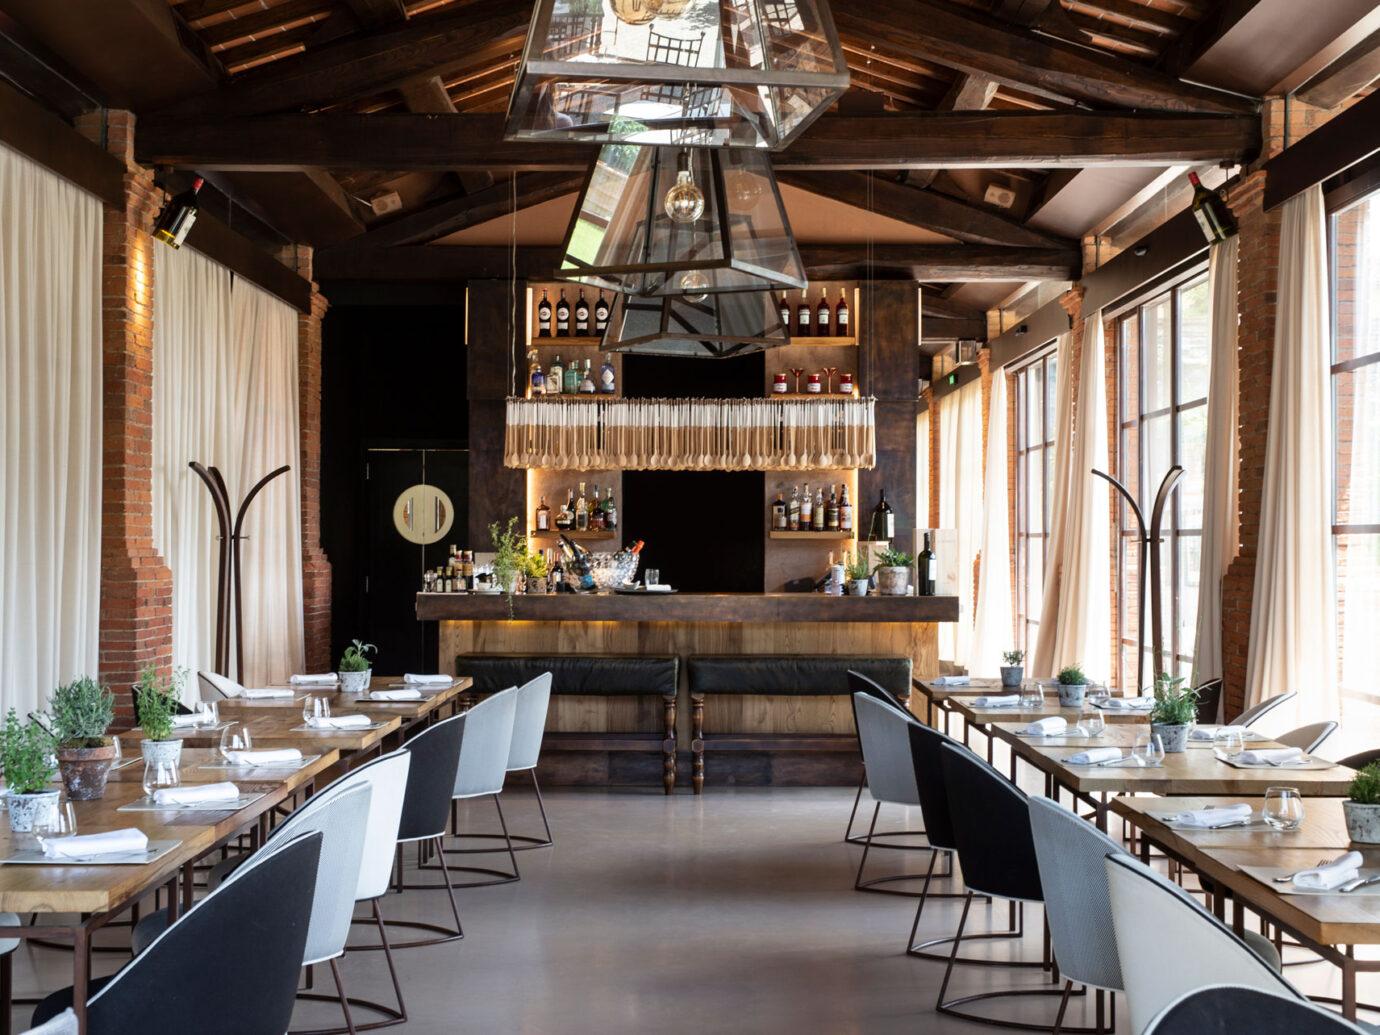 Dining area at at Il Borro